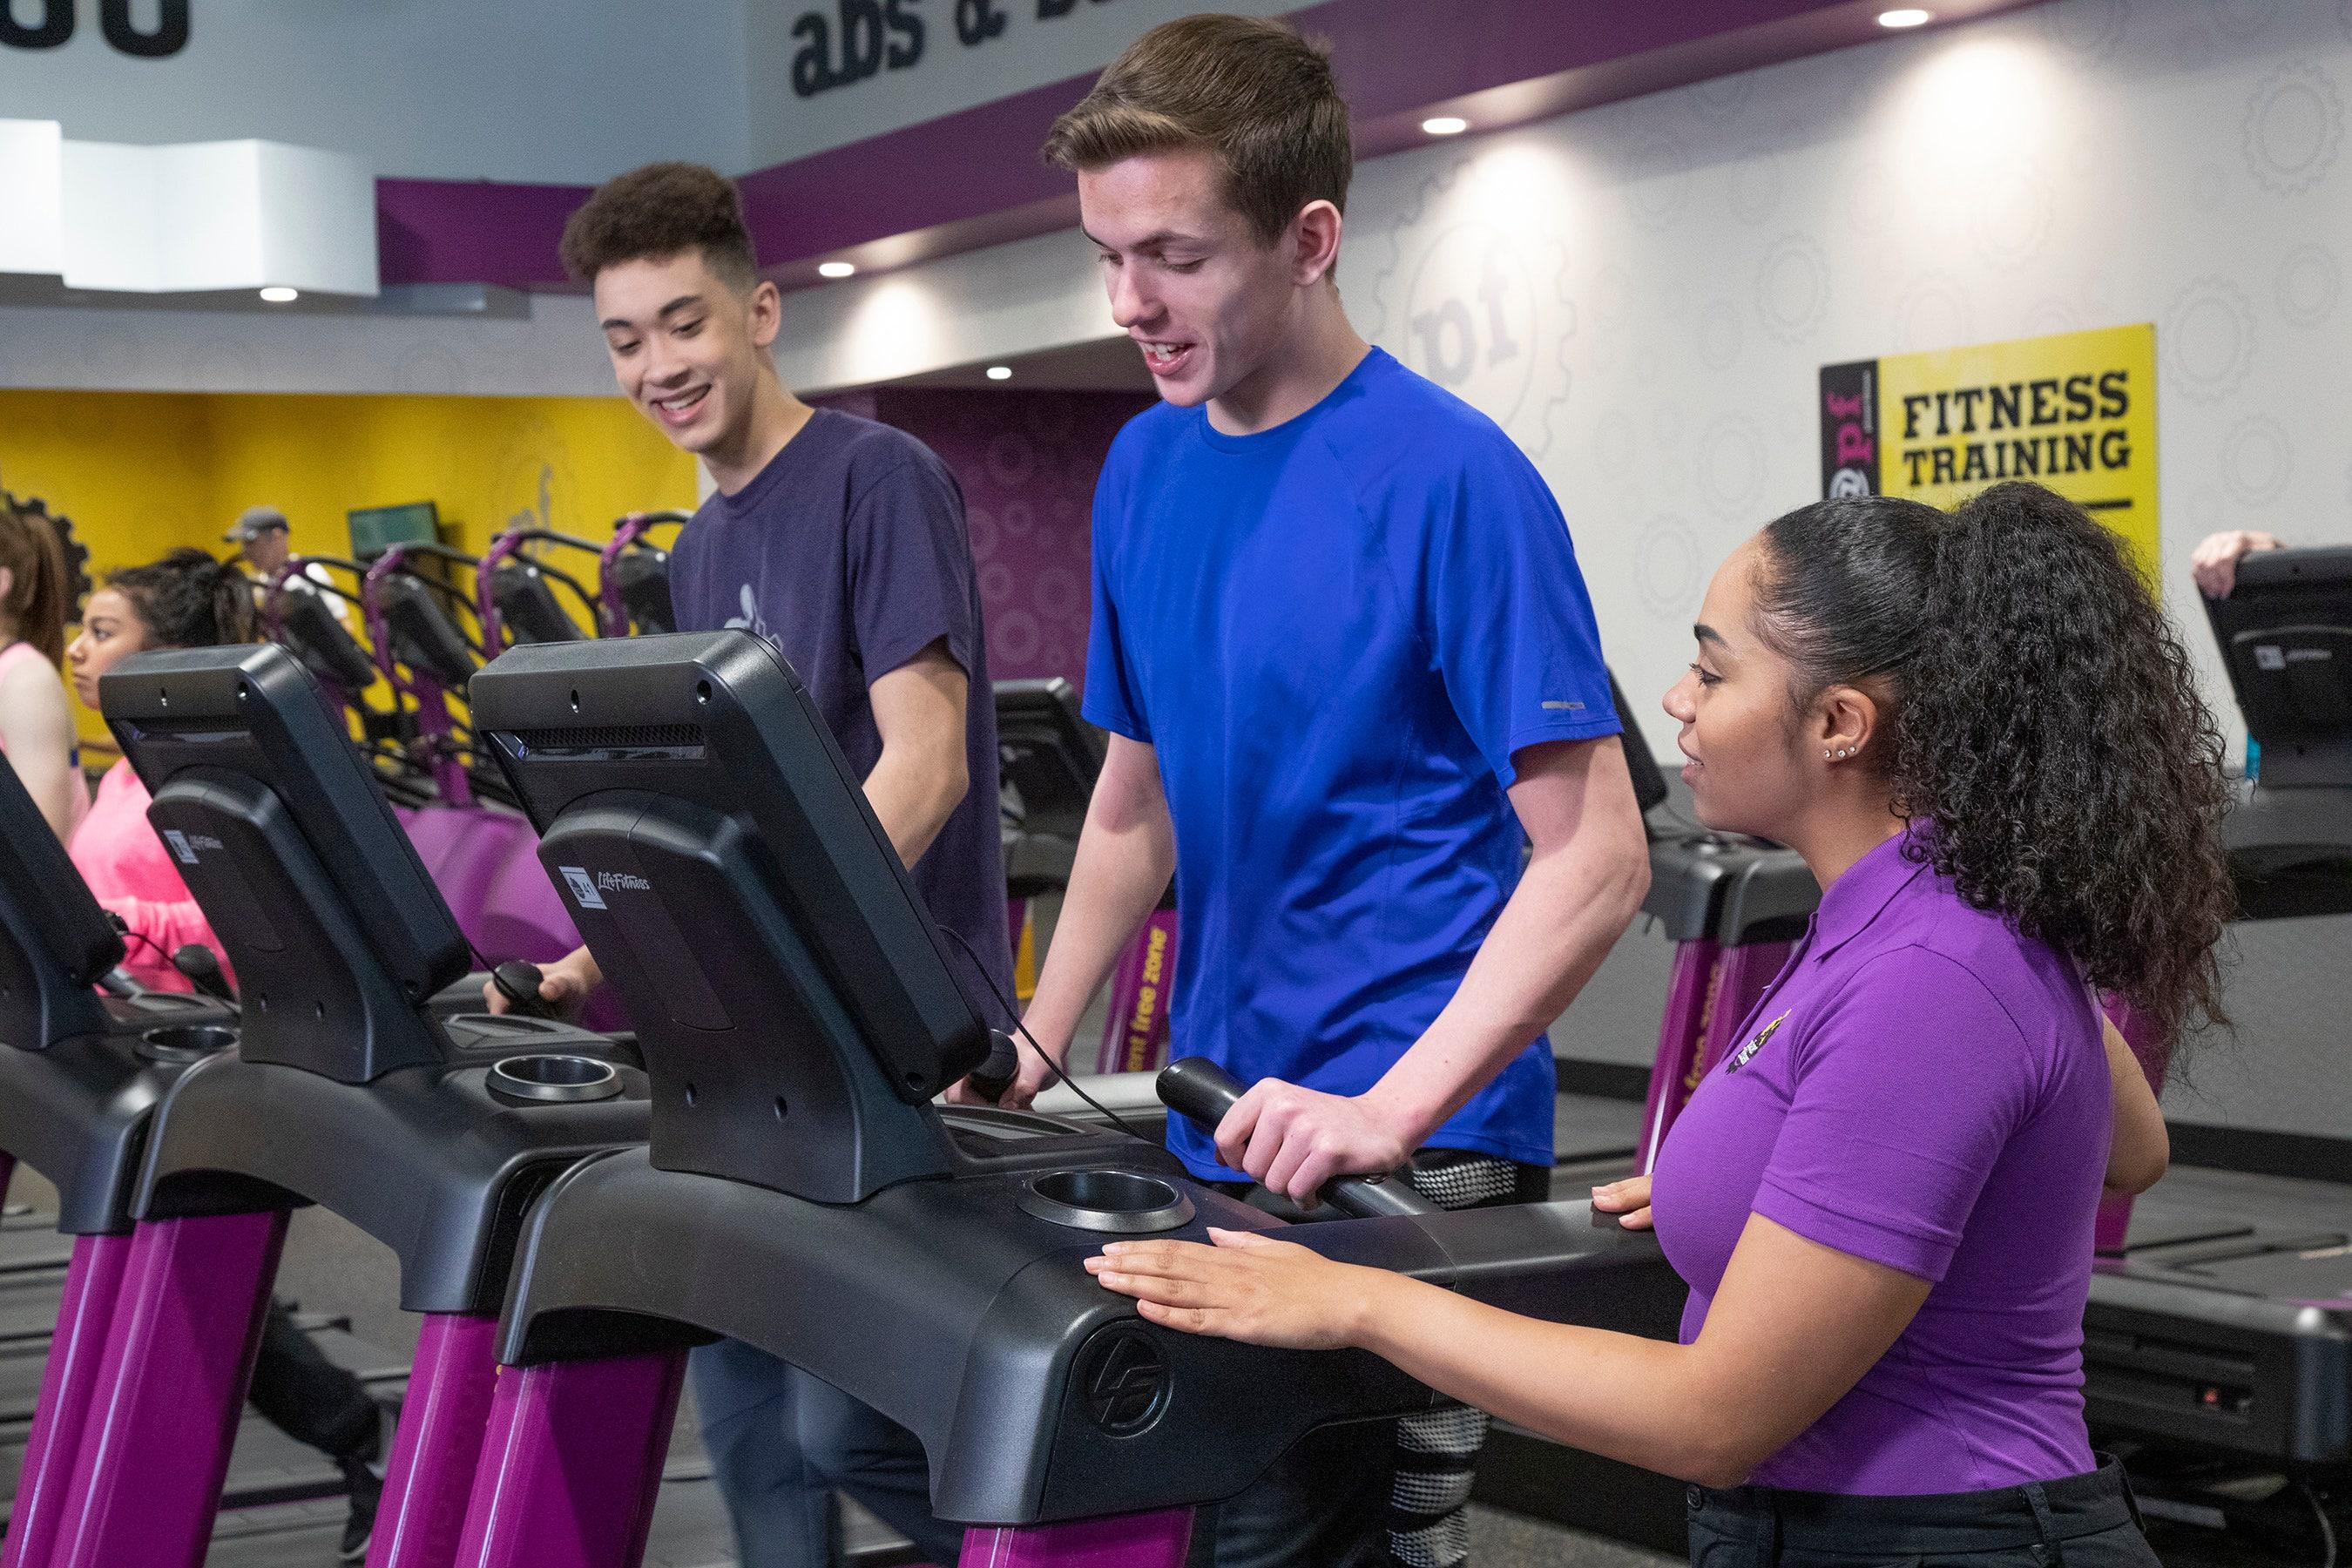 Of teen gym memberships are